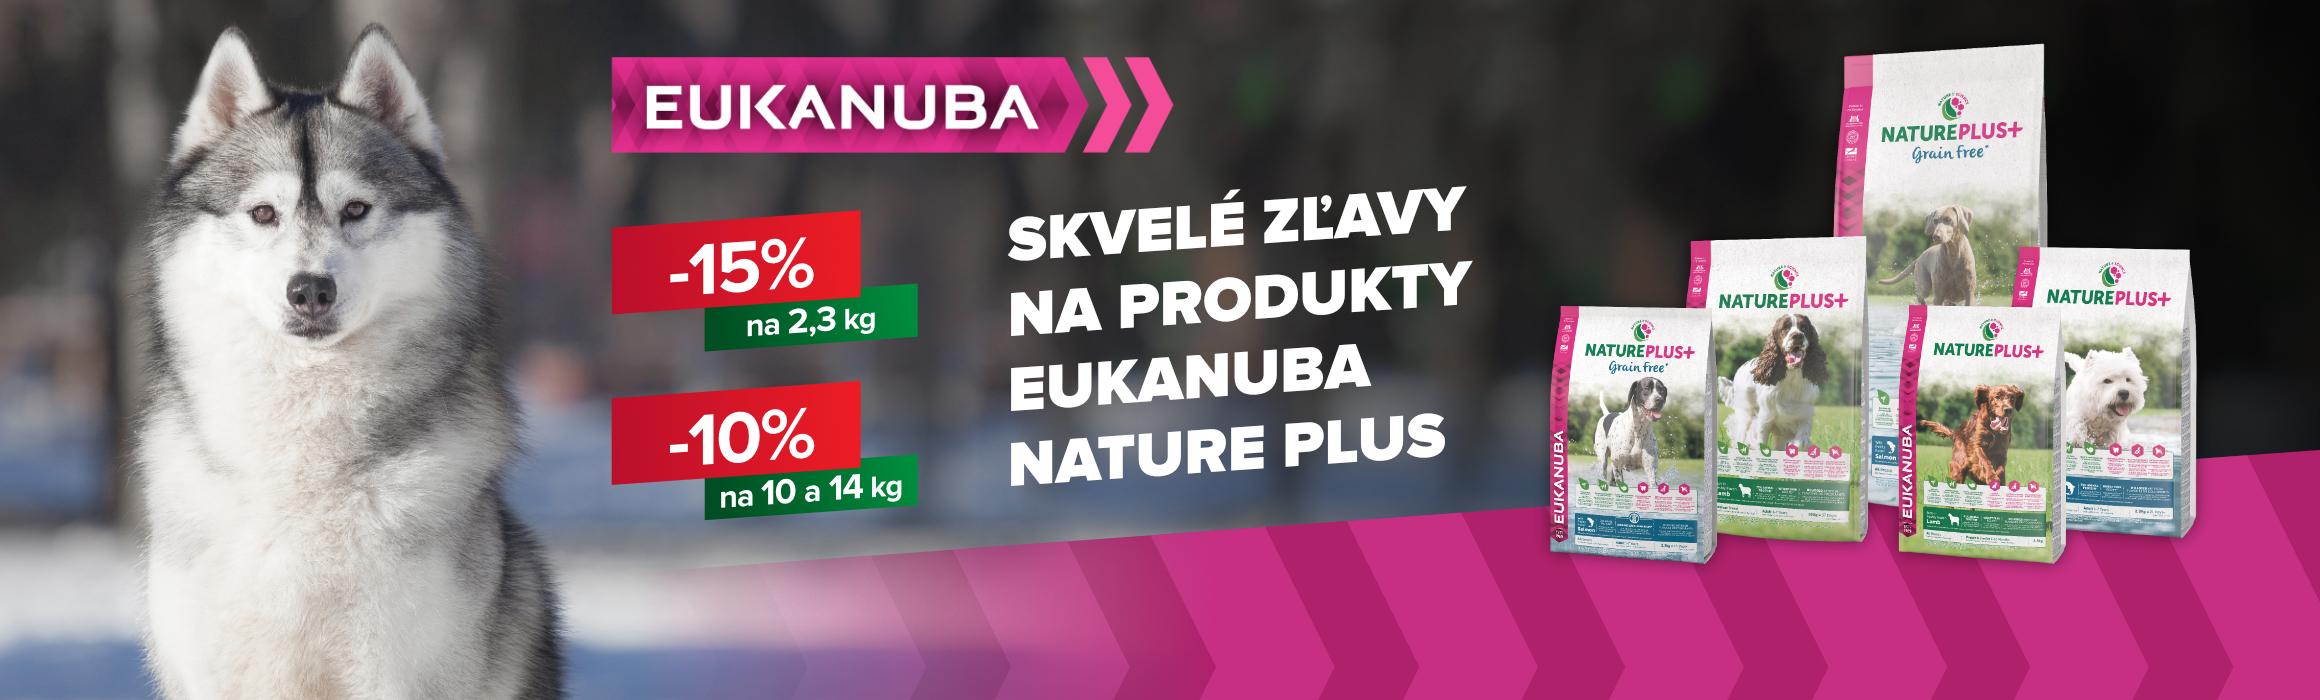 EUKANUBA Skvelé zľavy na produkty EUKANUBA NATURE PLUS